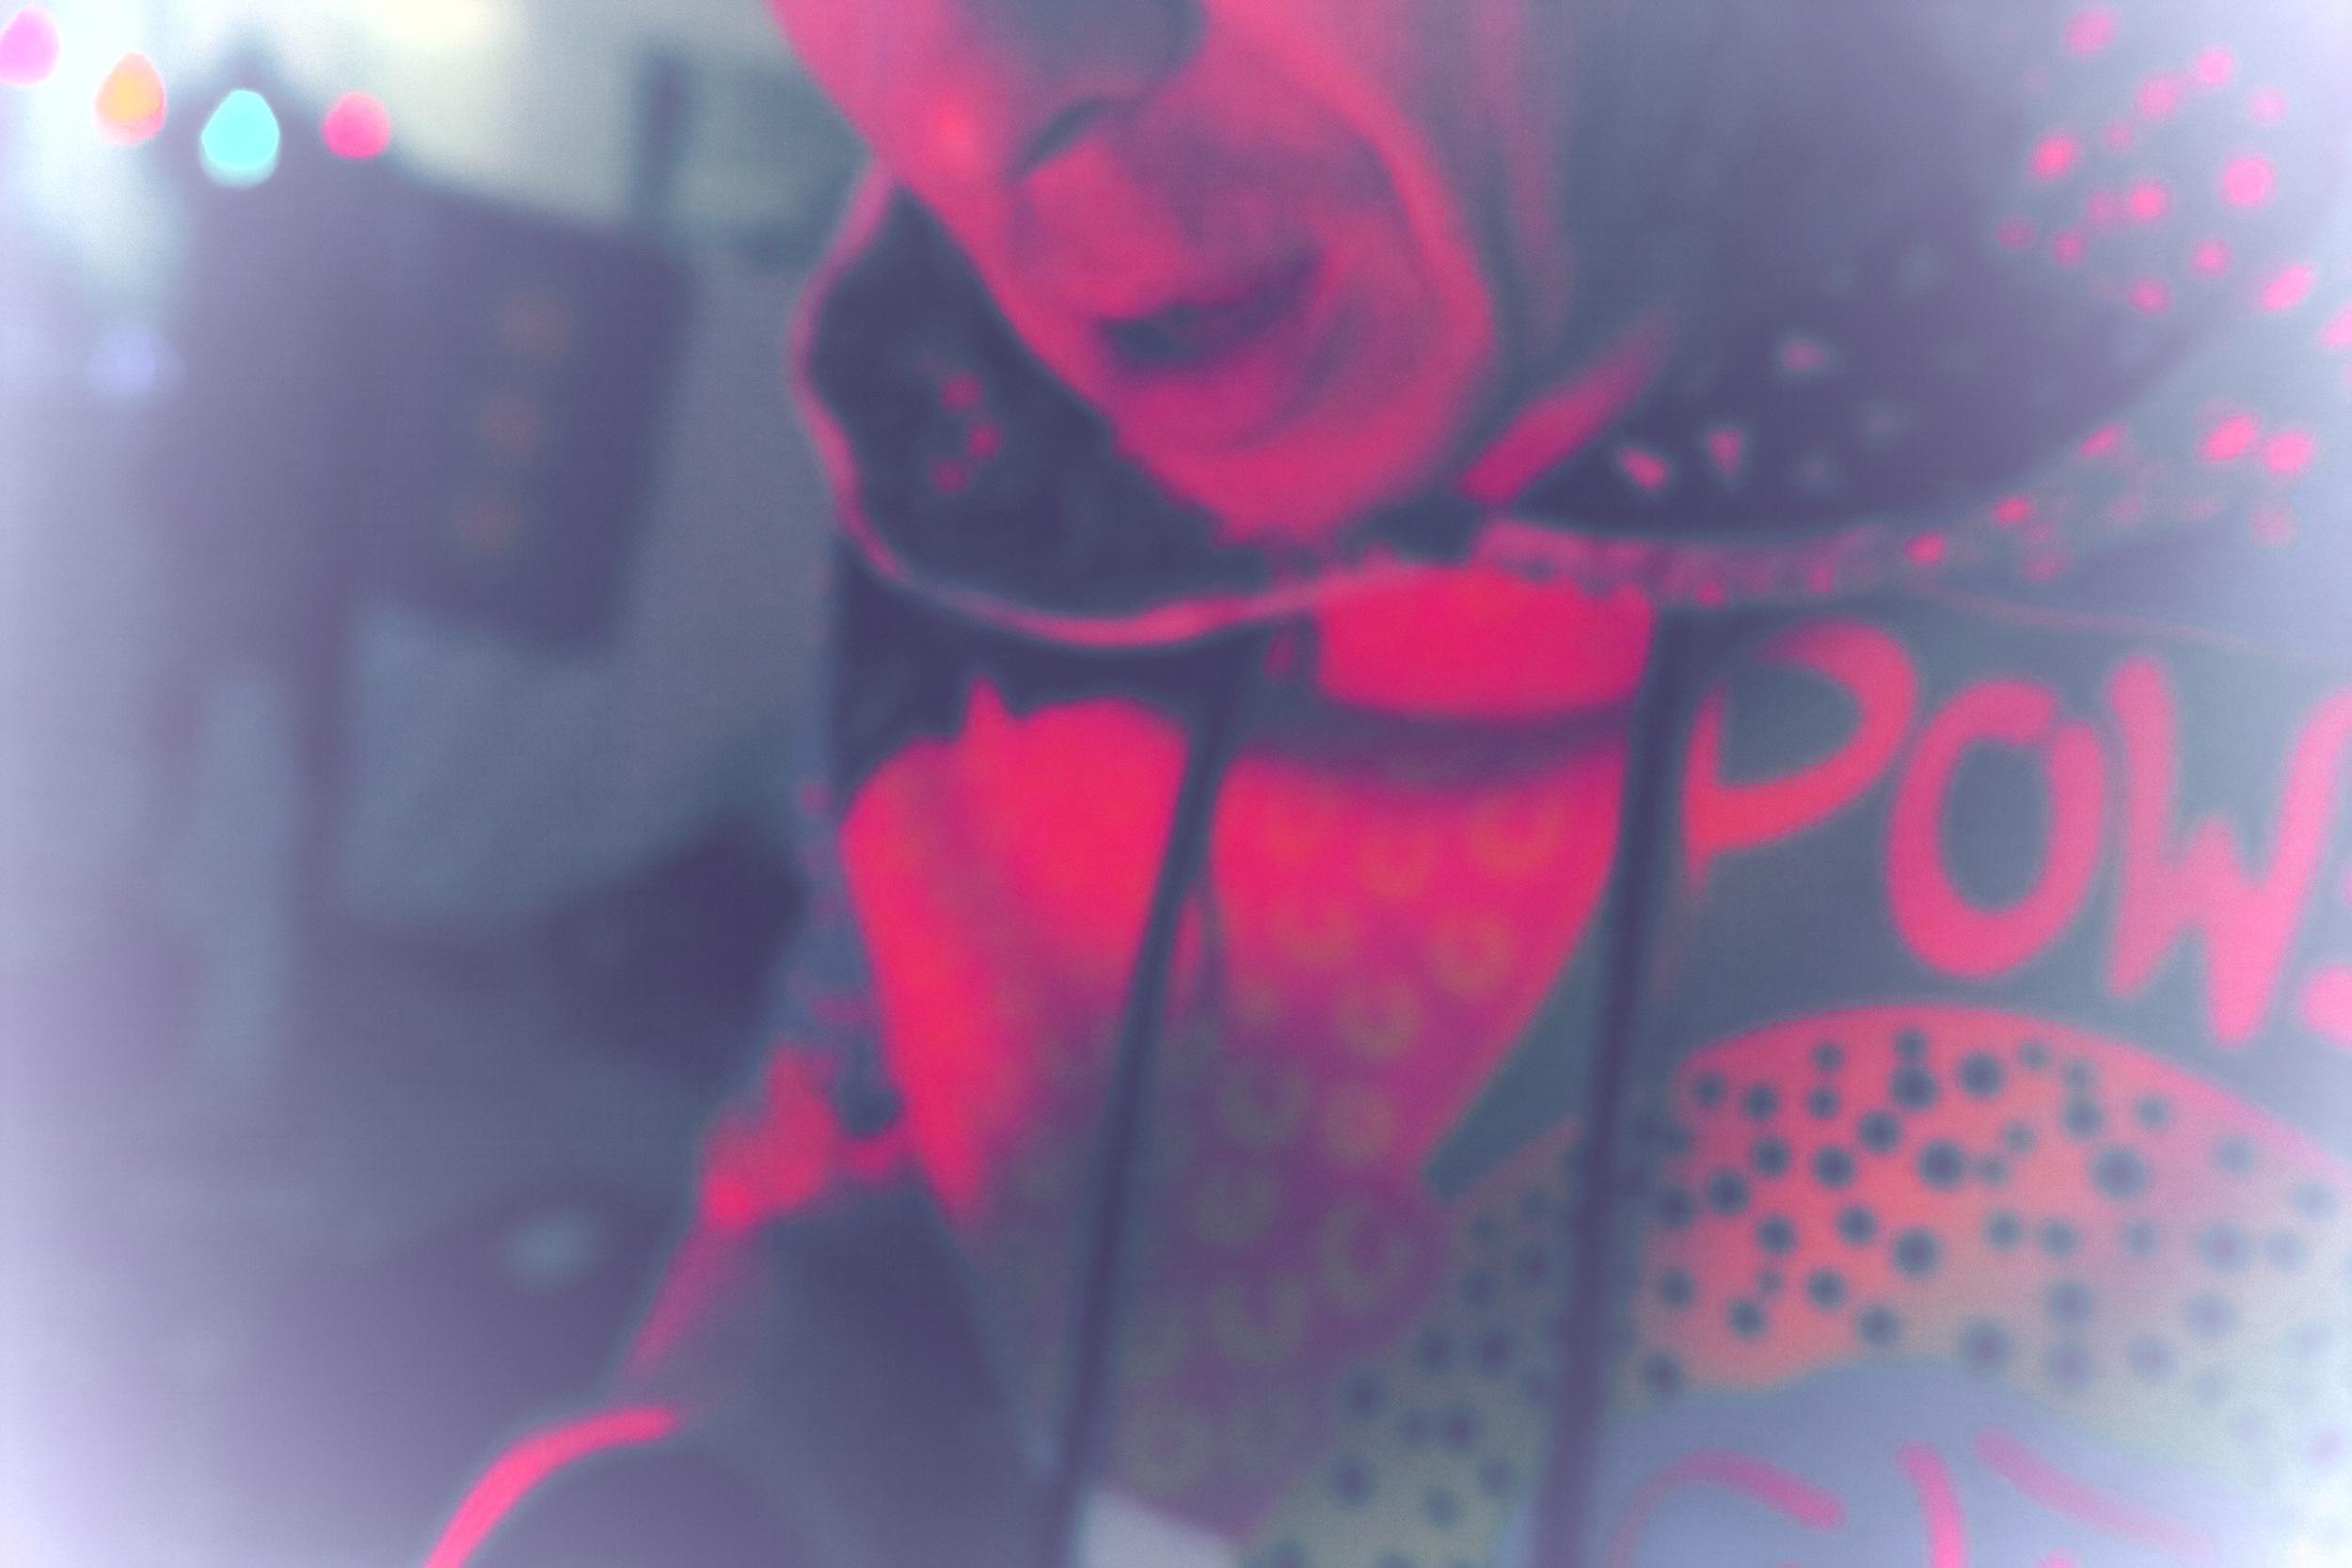 SID_SidWilson_DJStarScream_KinzeeTeal_003.jpg